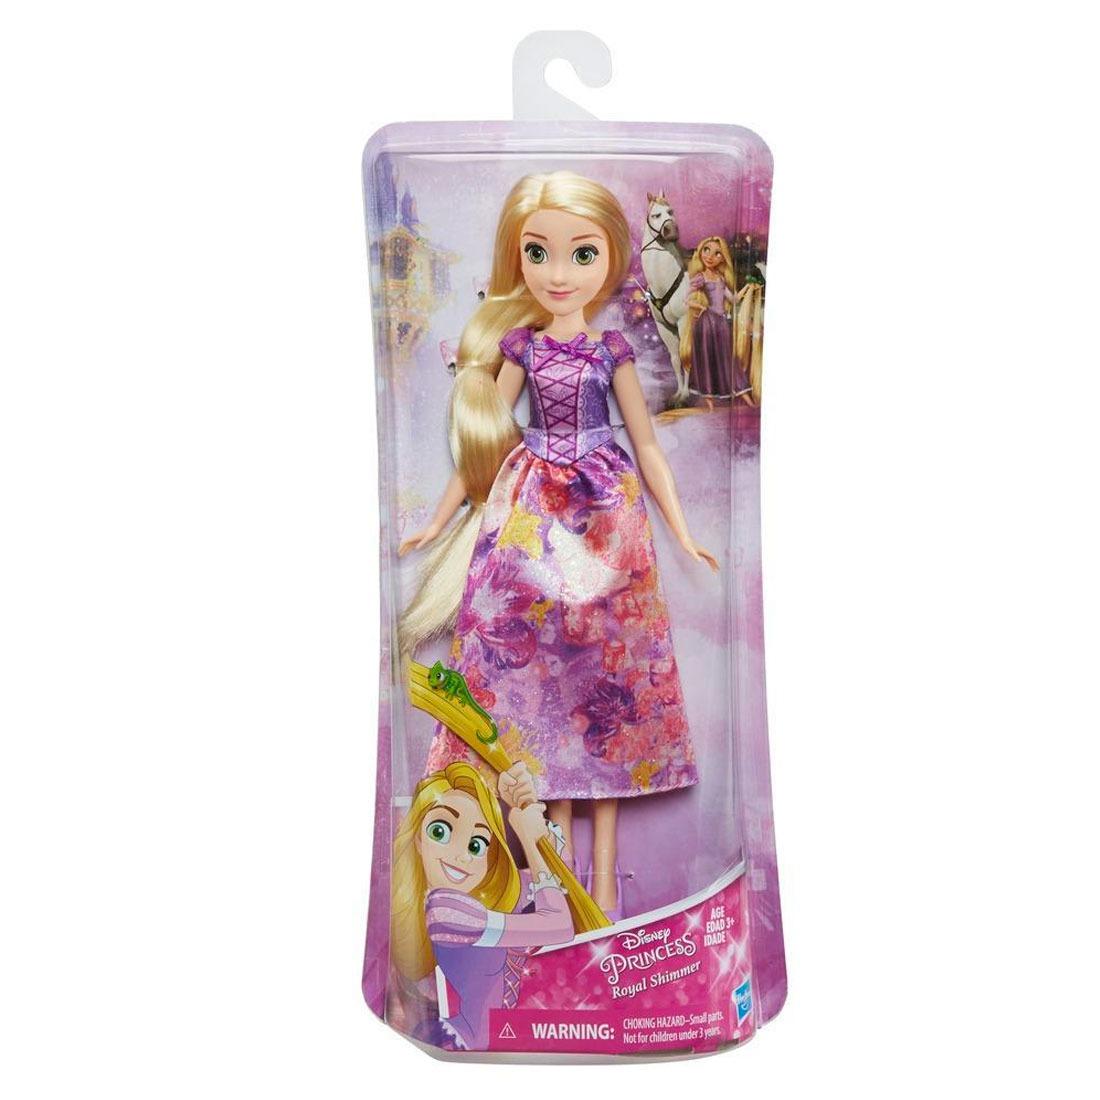 Muñeca Hasbro Royal En Rapunzel Shimmer 299 00 Disney Princesas r6rqw